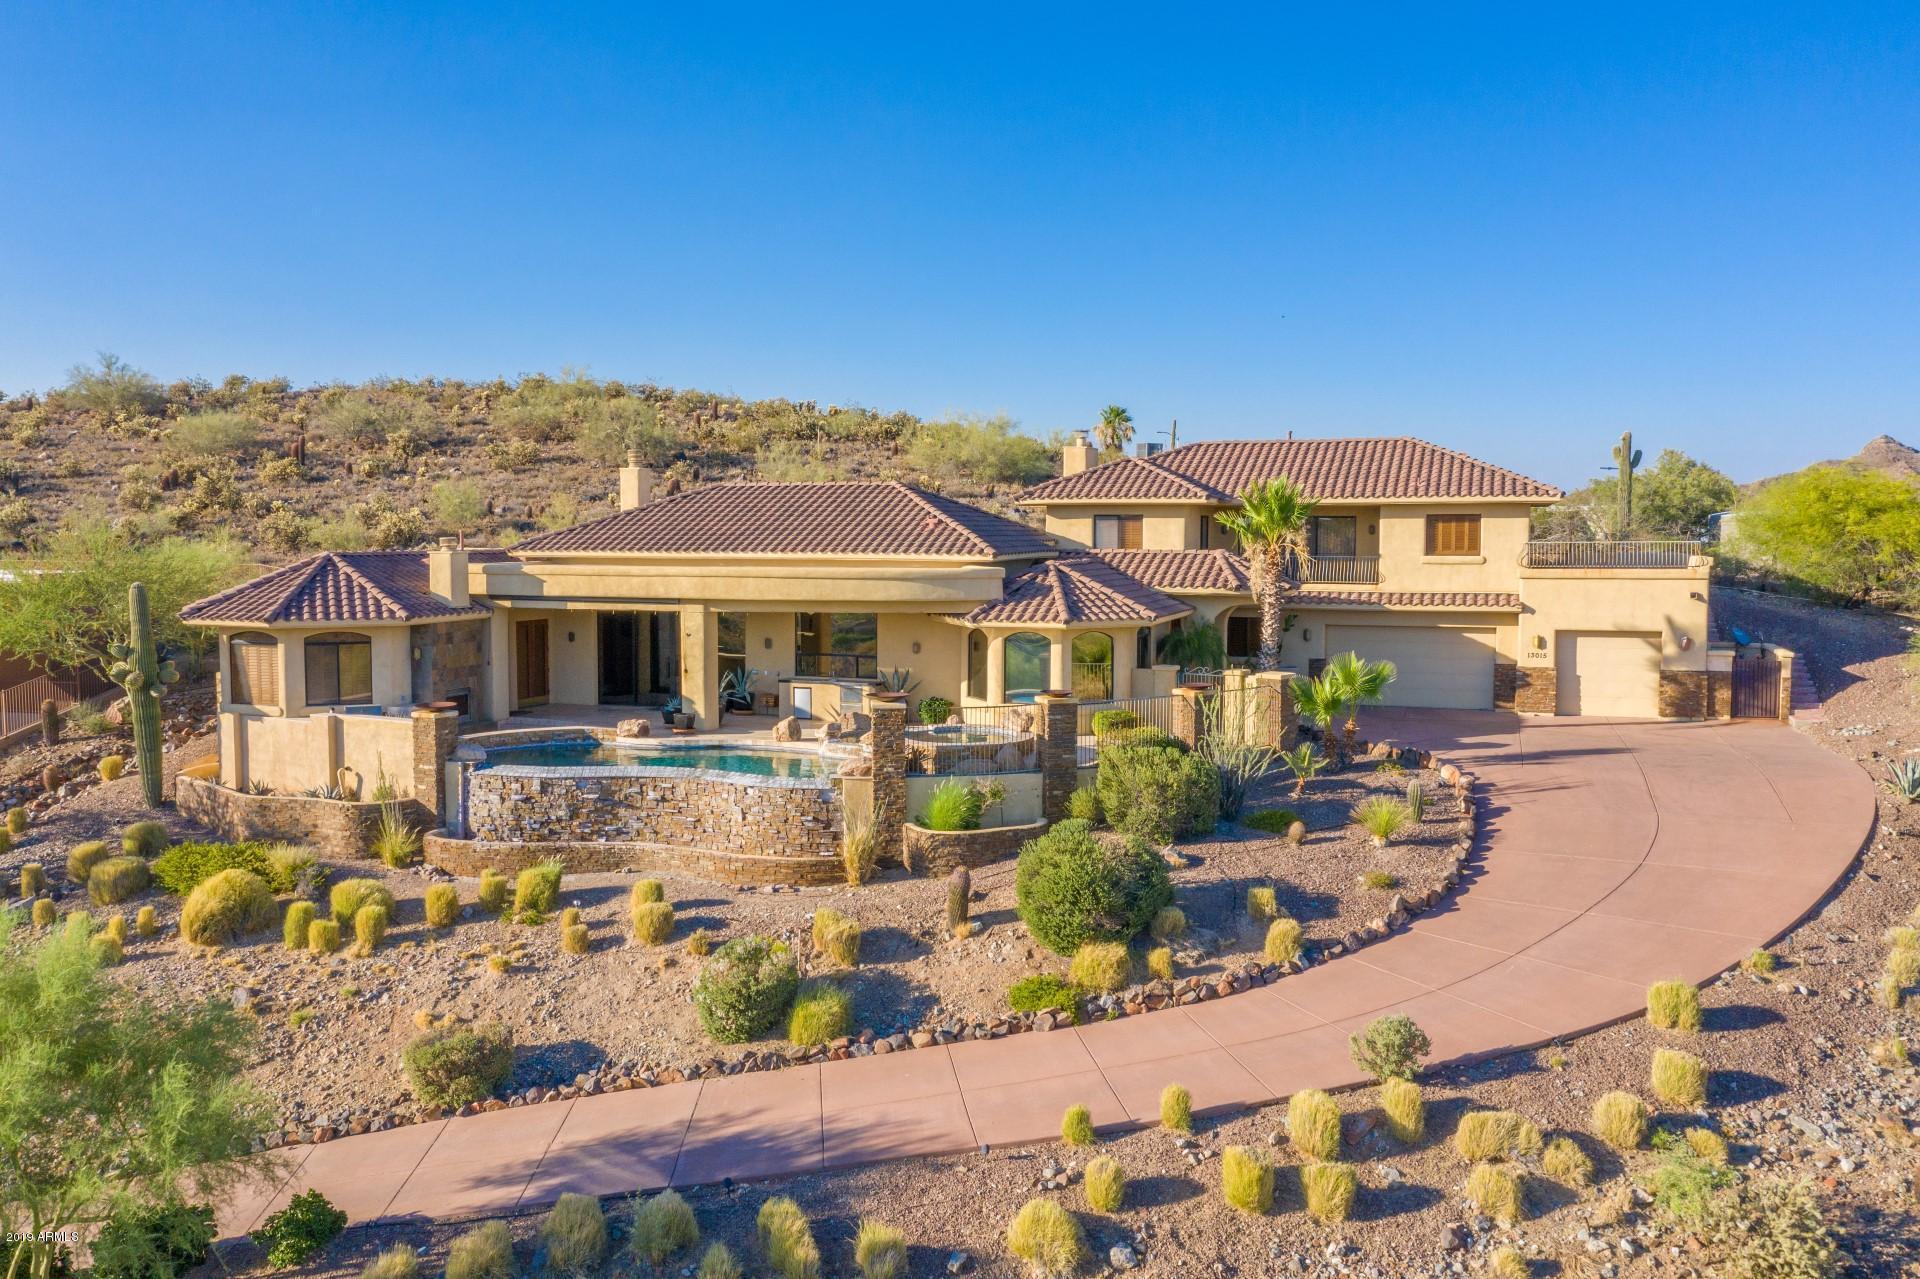 Photo of 13015 N 17TH Place, Phoenix, AZ 85022